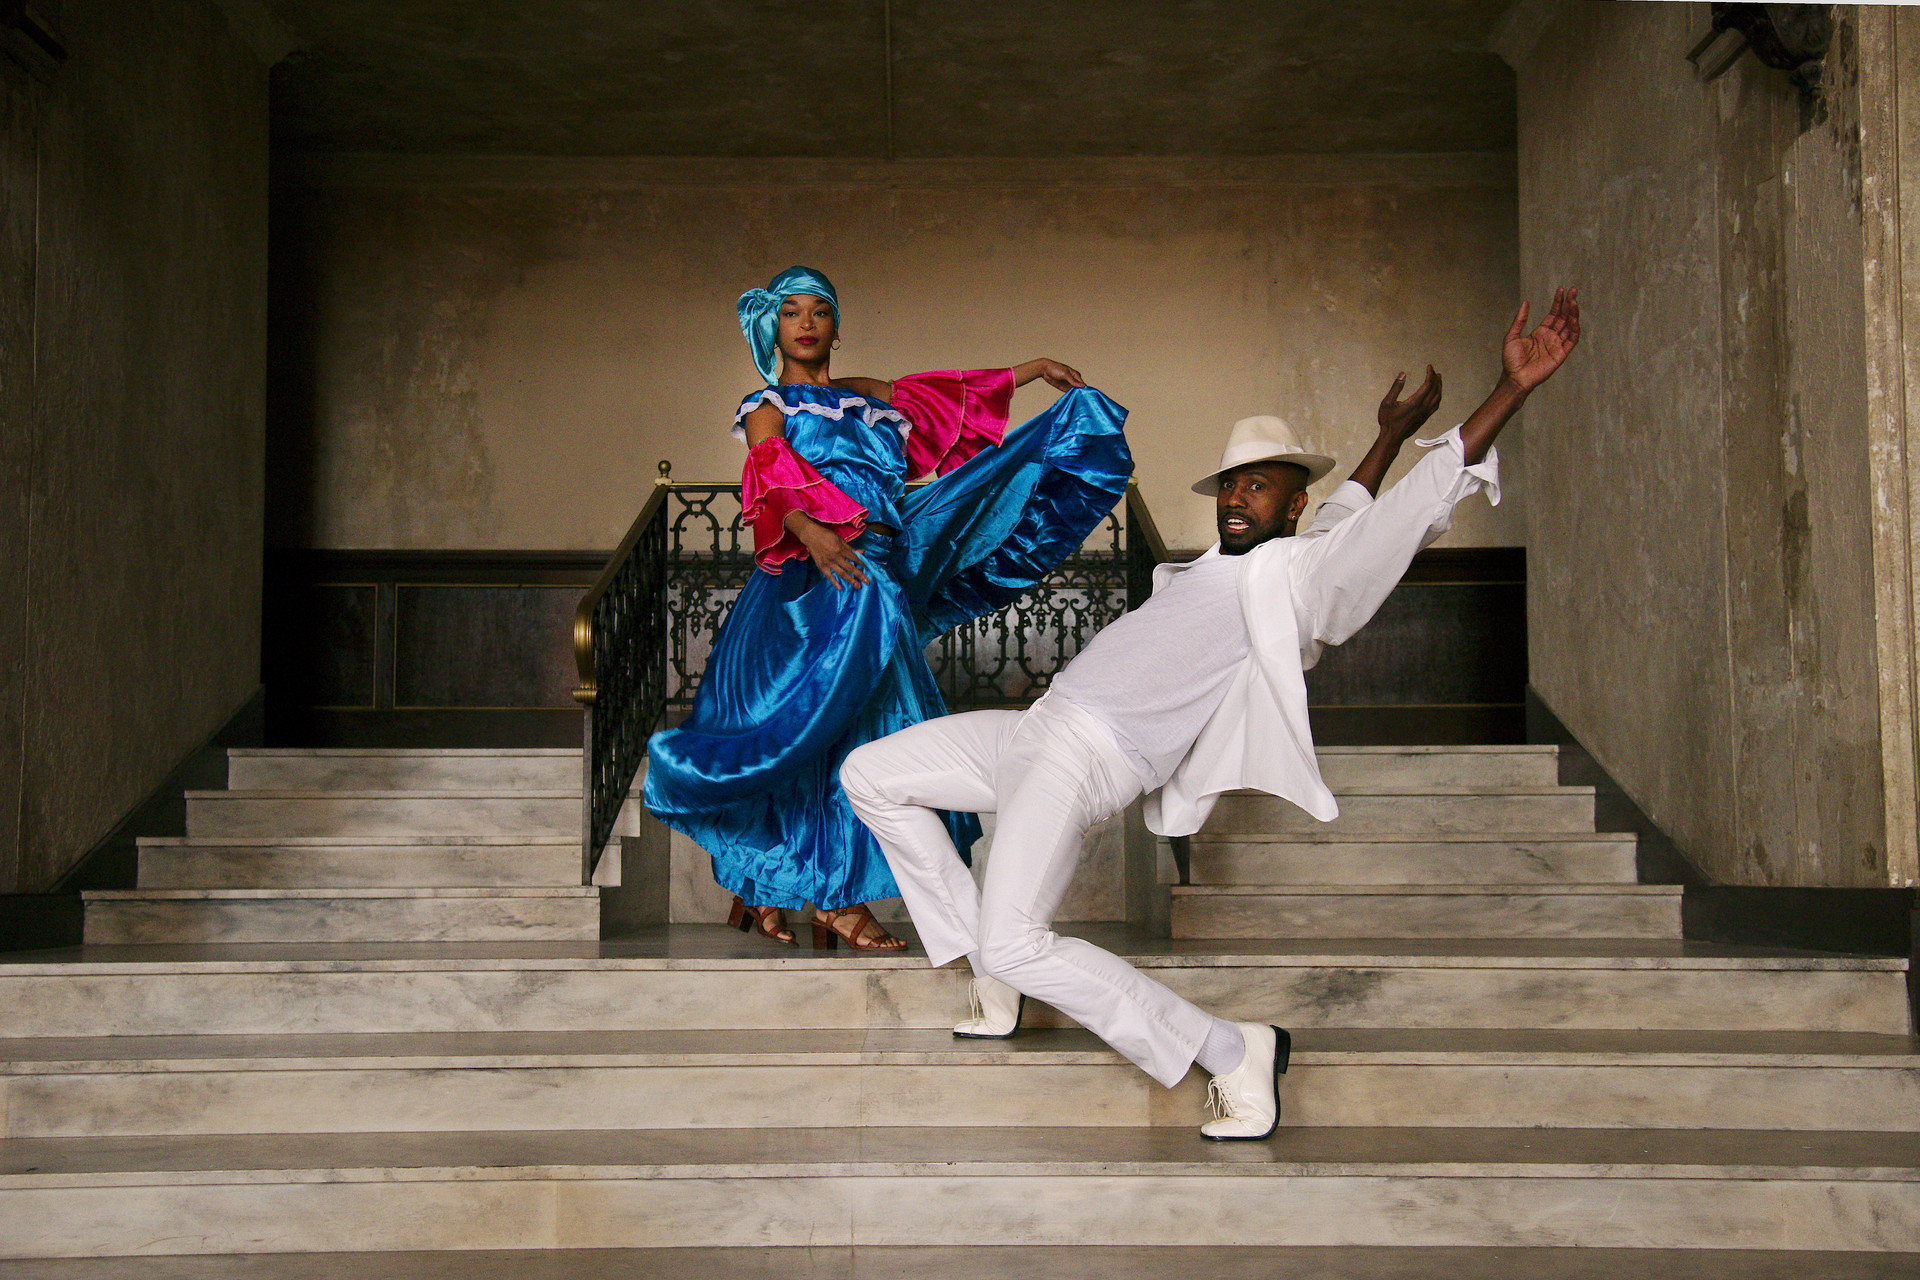 Tahjanee singleton of Alafia Dance Ensemble and Denmis Bain Savigne of Alayo Dance Company by Andy Mogg